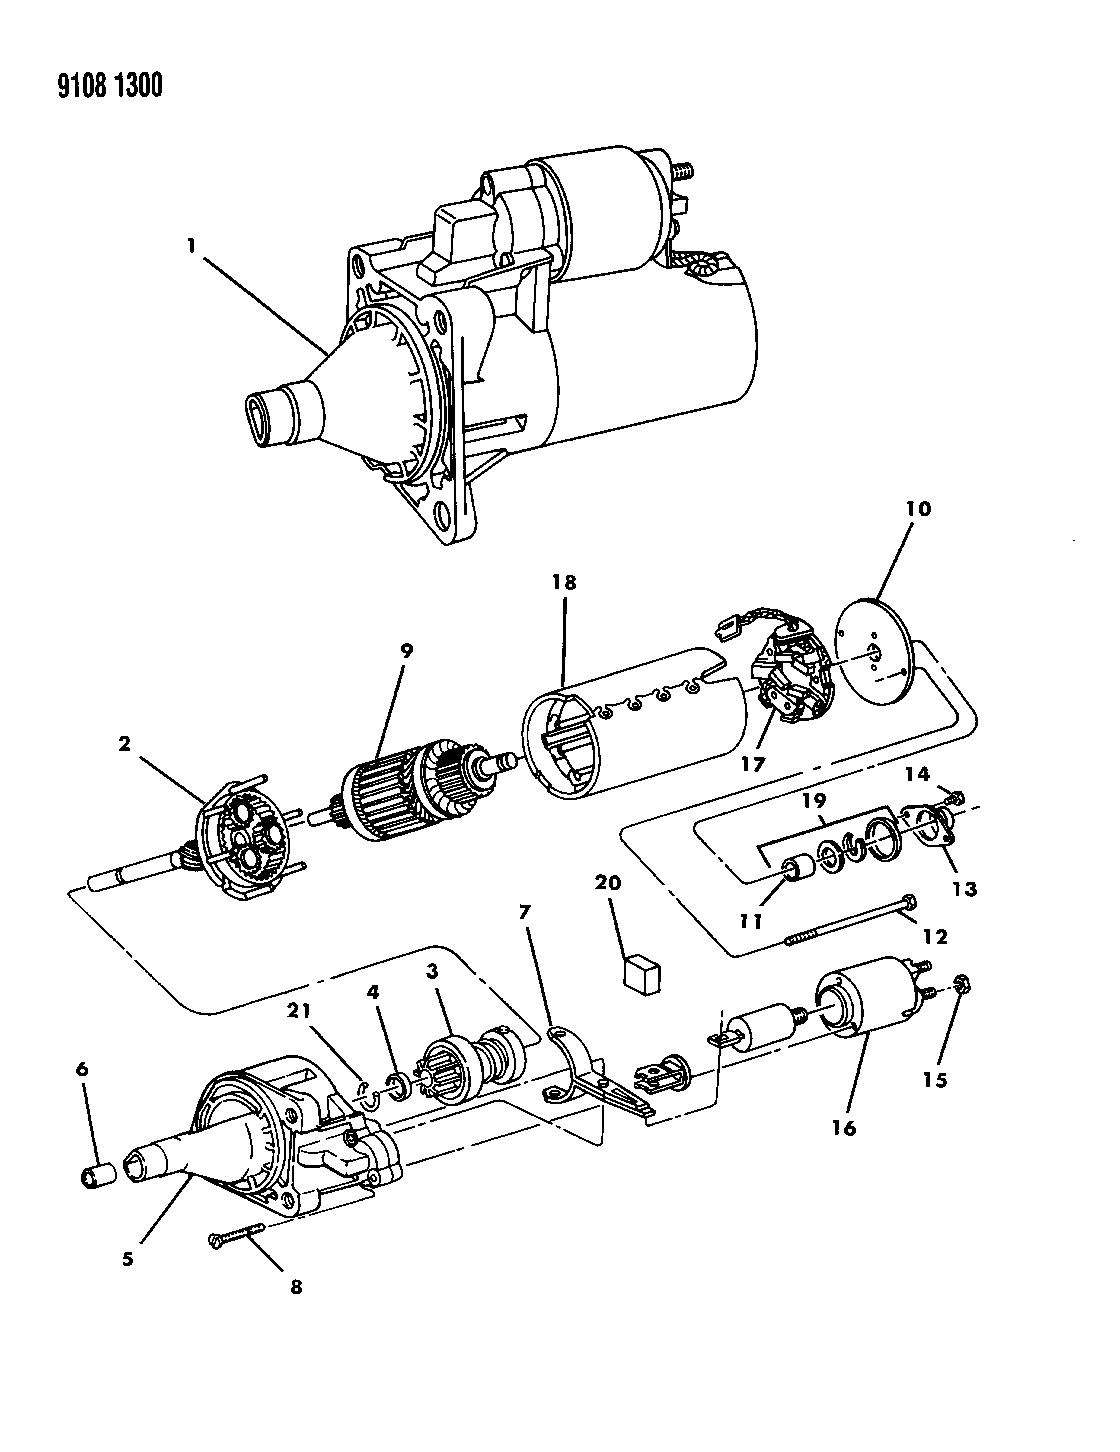 1989 Dodge Aries Starter